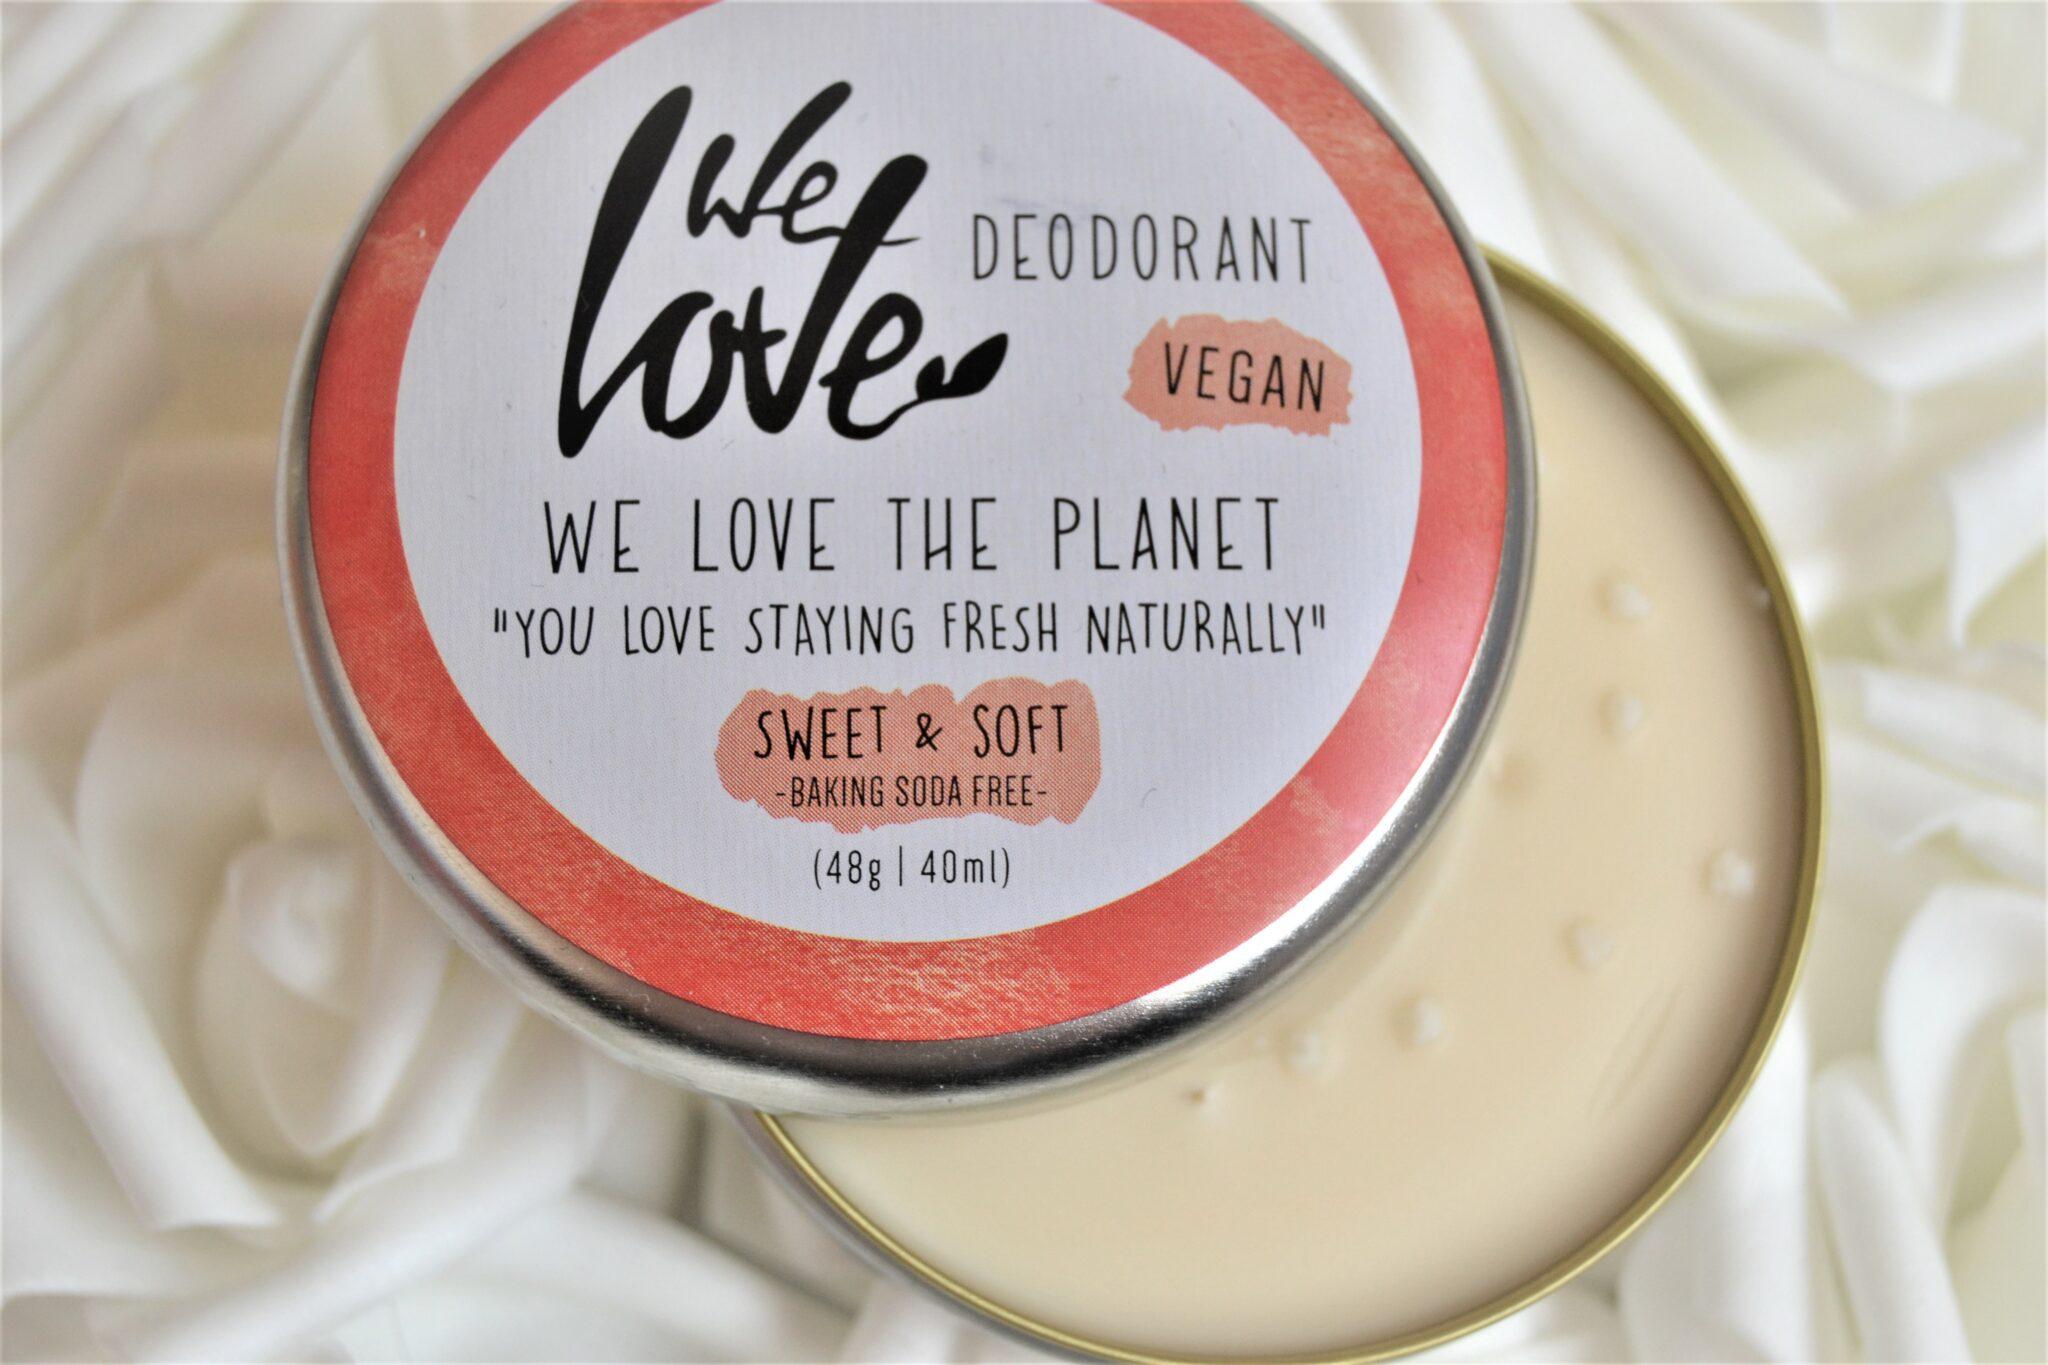 sweet & soft we love the planet déodorant vegan